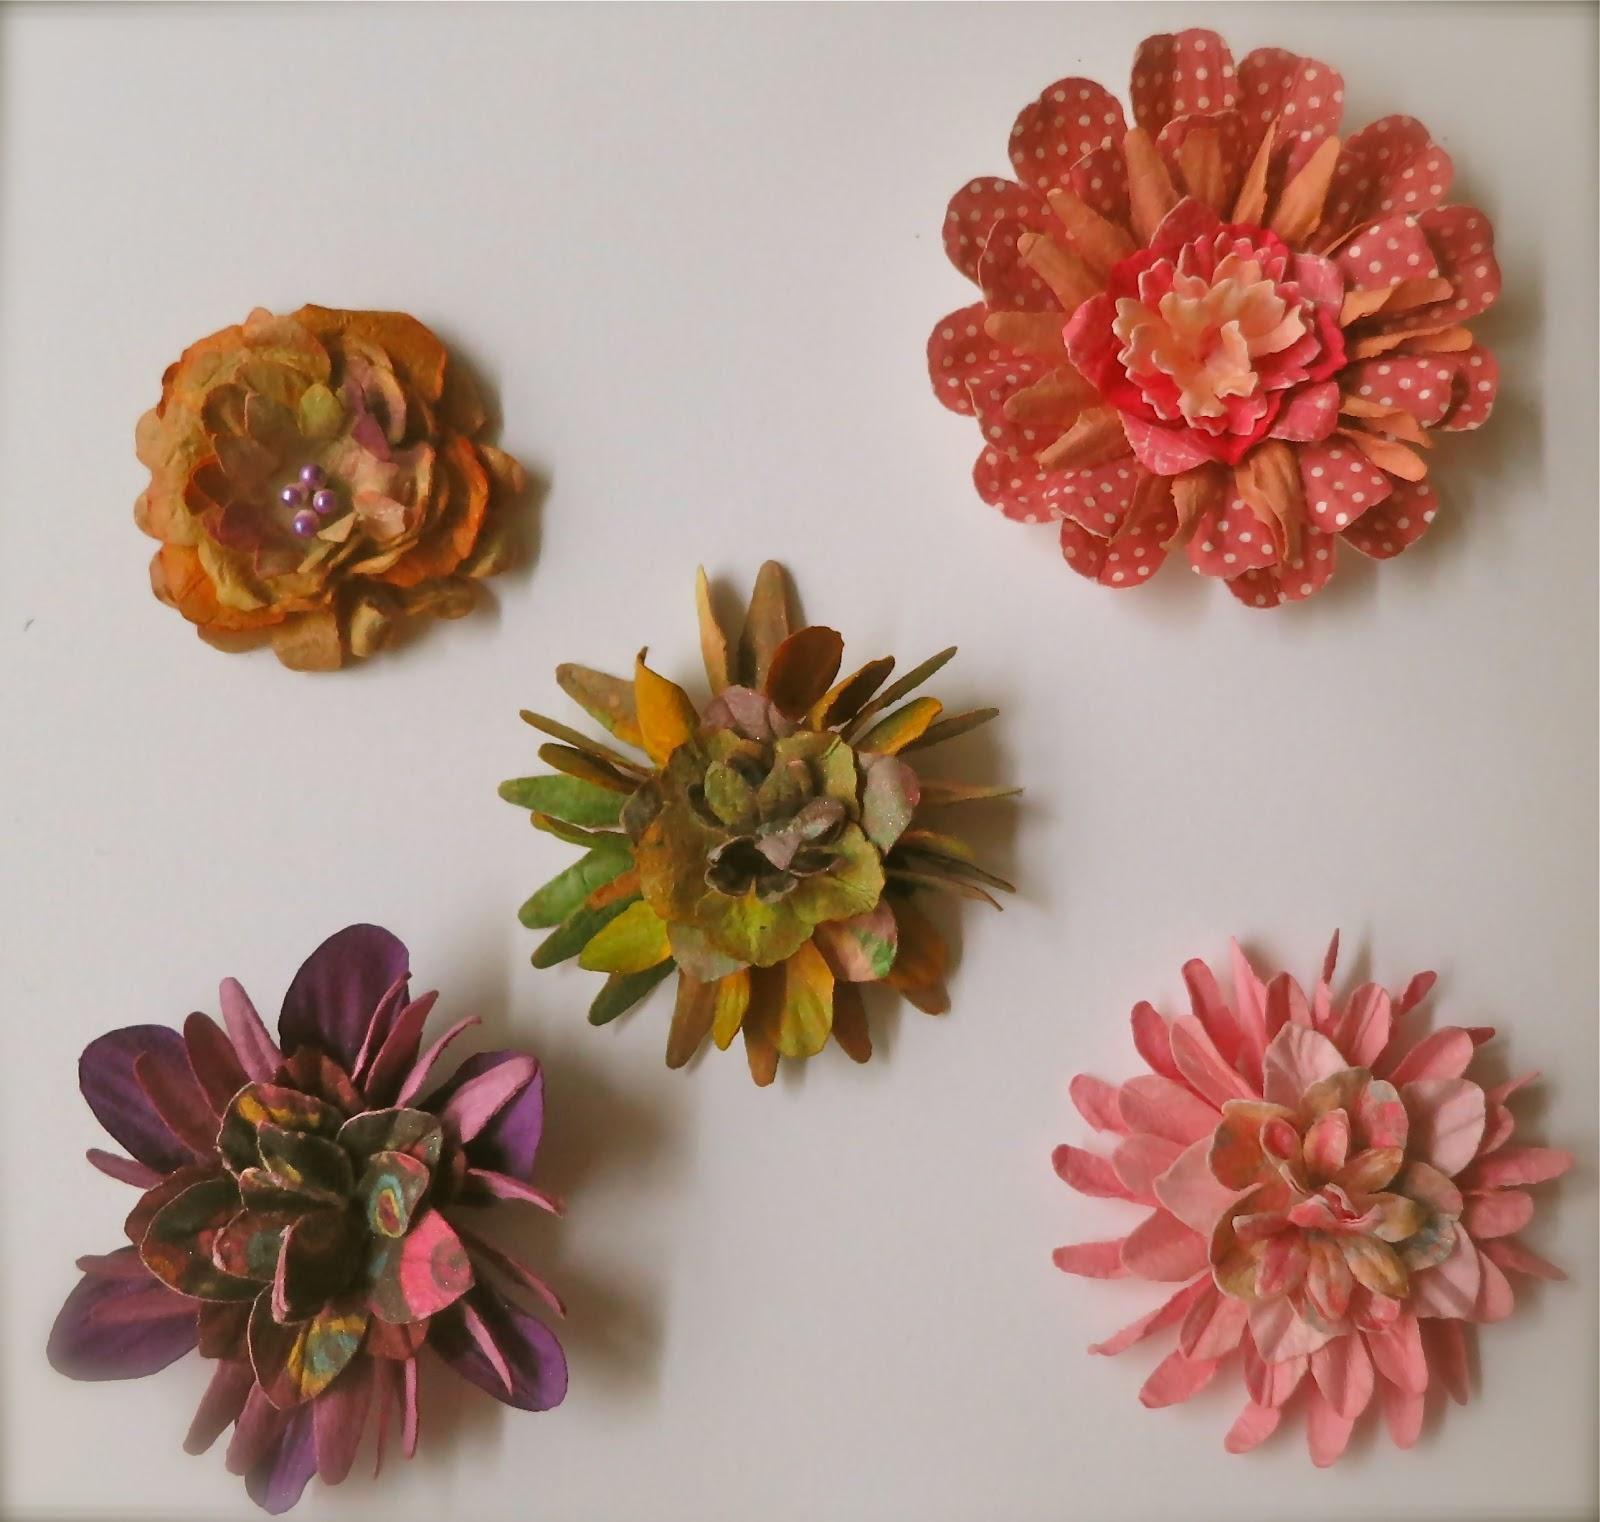 Walk with god 39 s favor handmade paper flower for Handmade paper flowers tutorial